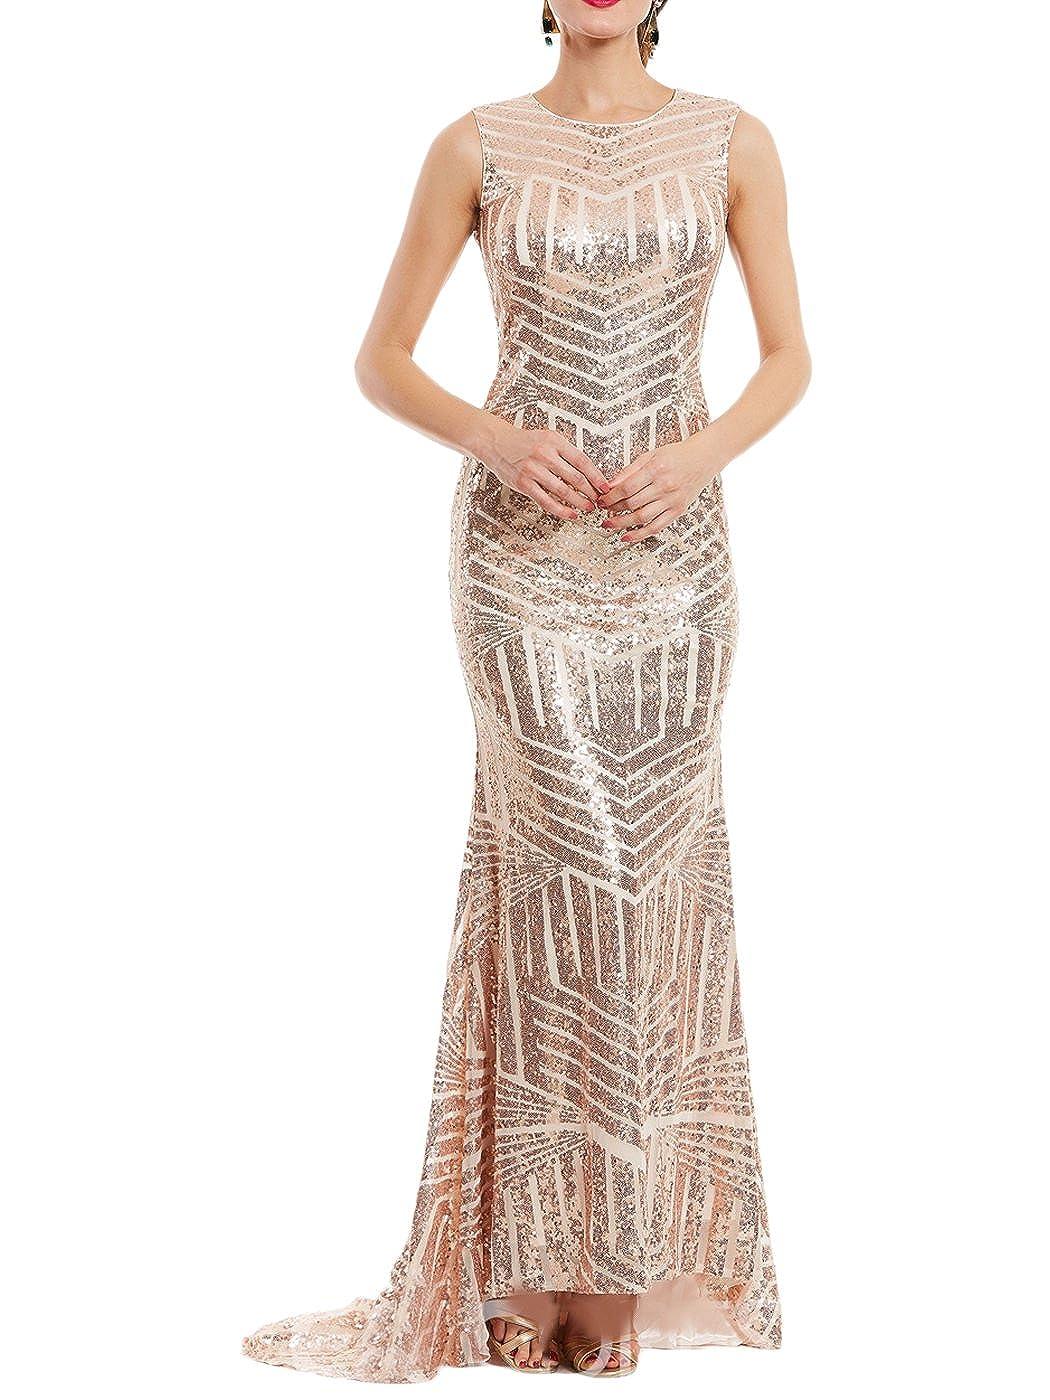 Mermaid Sequined Dresses Formal 2018 Women's Monalia